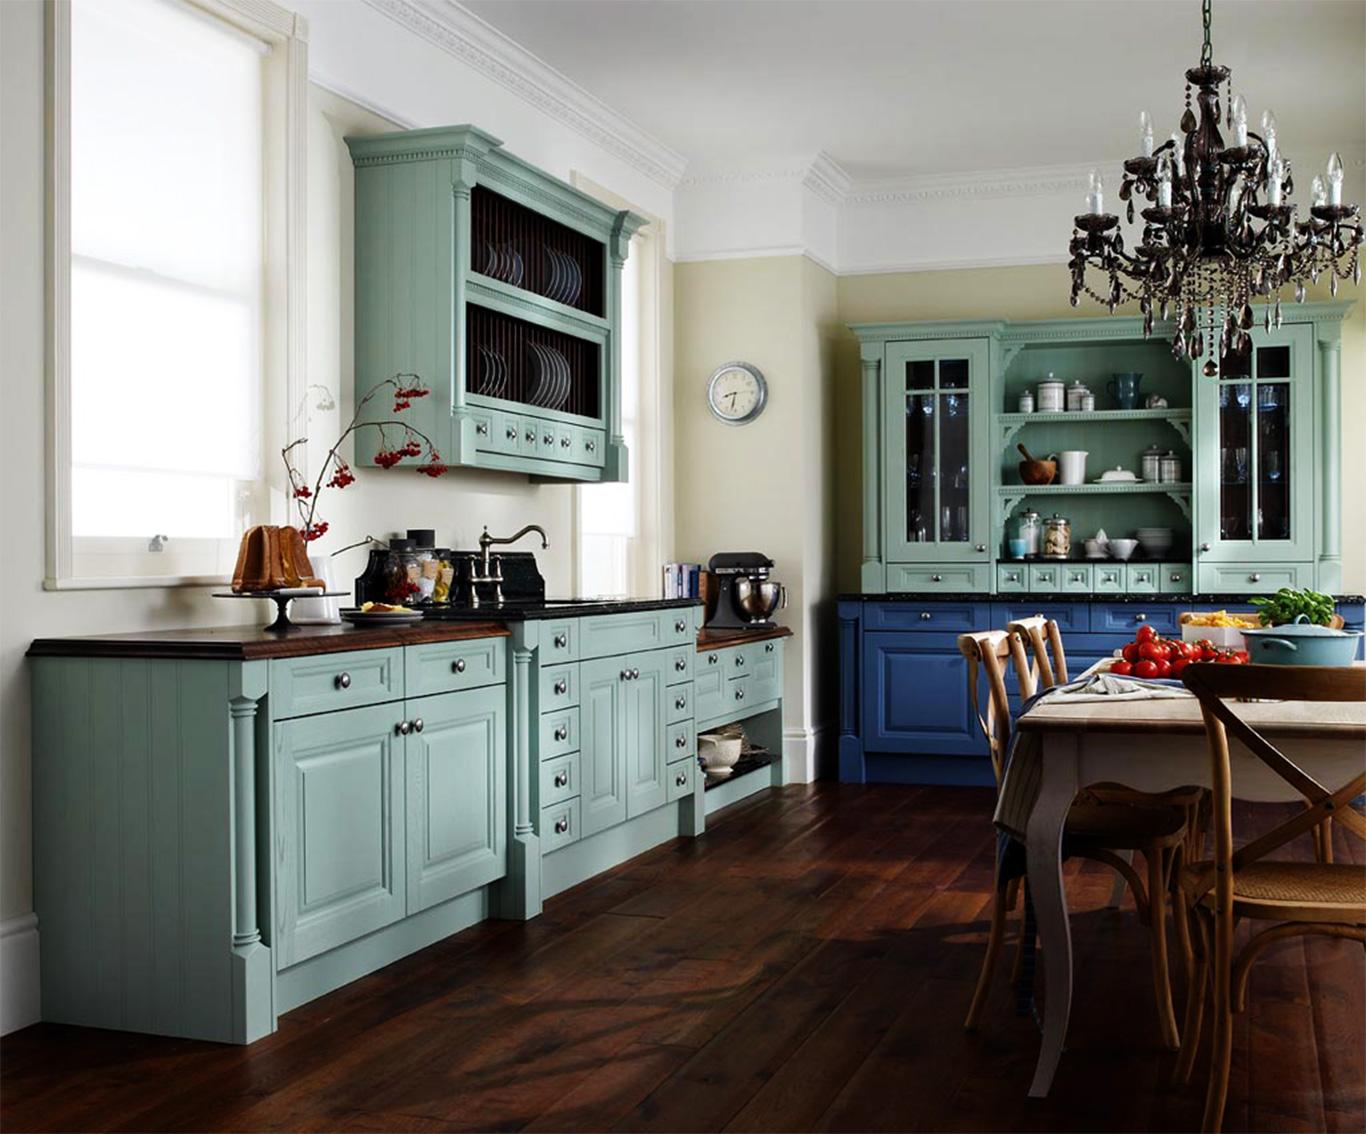 paint kitchen cabinets ideas what color photo - 5